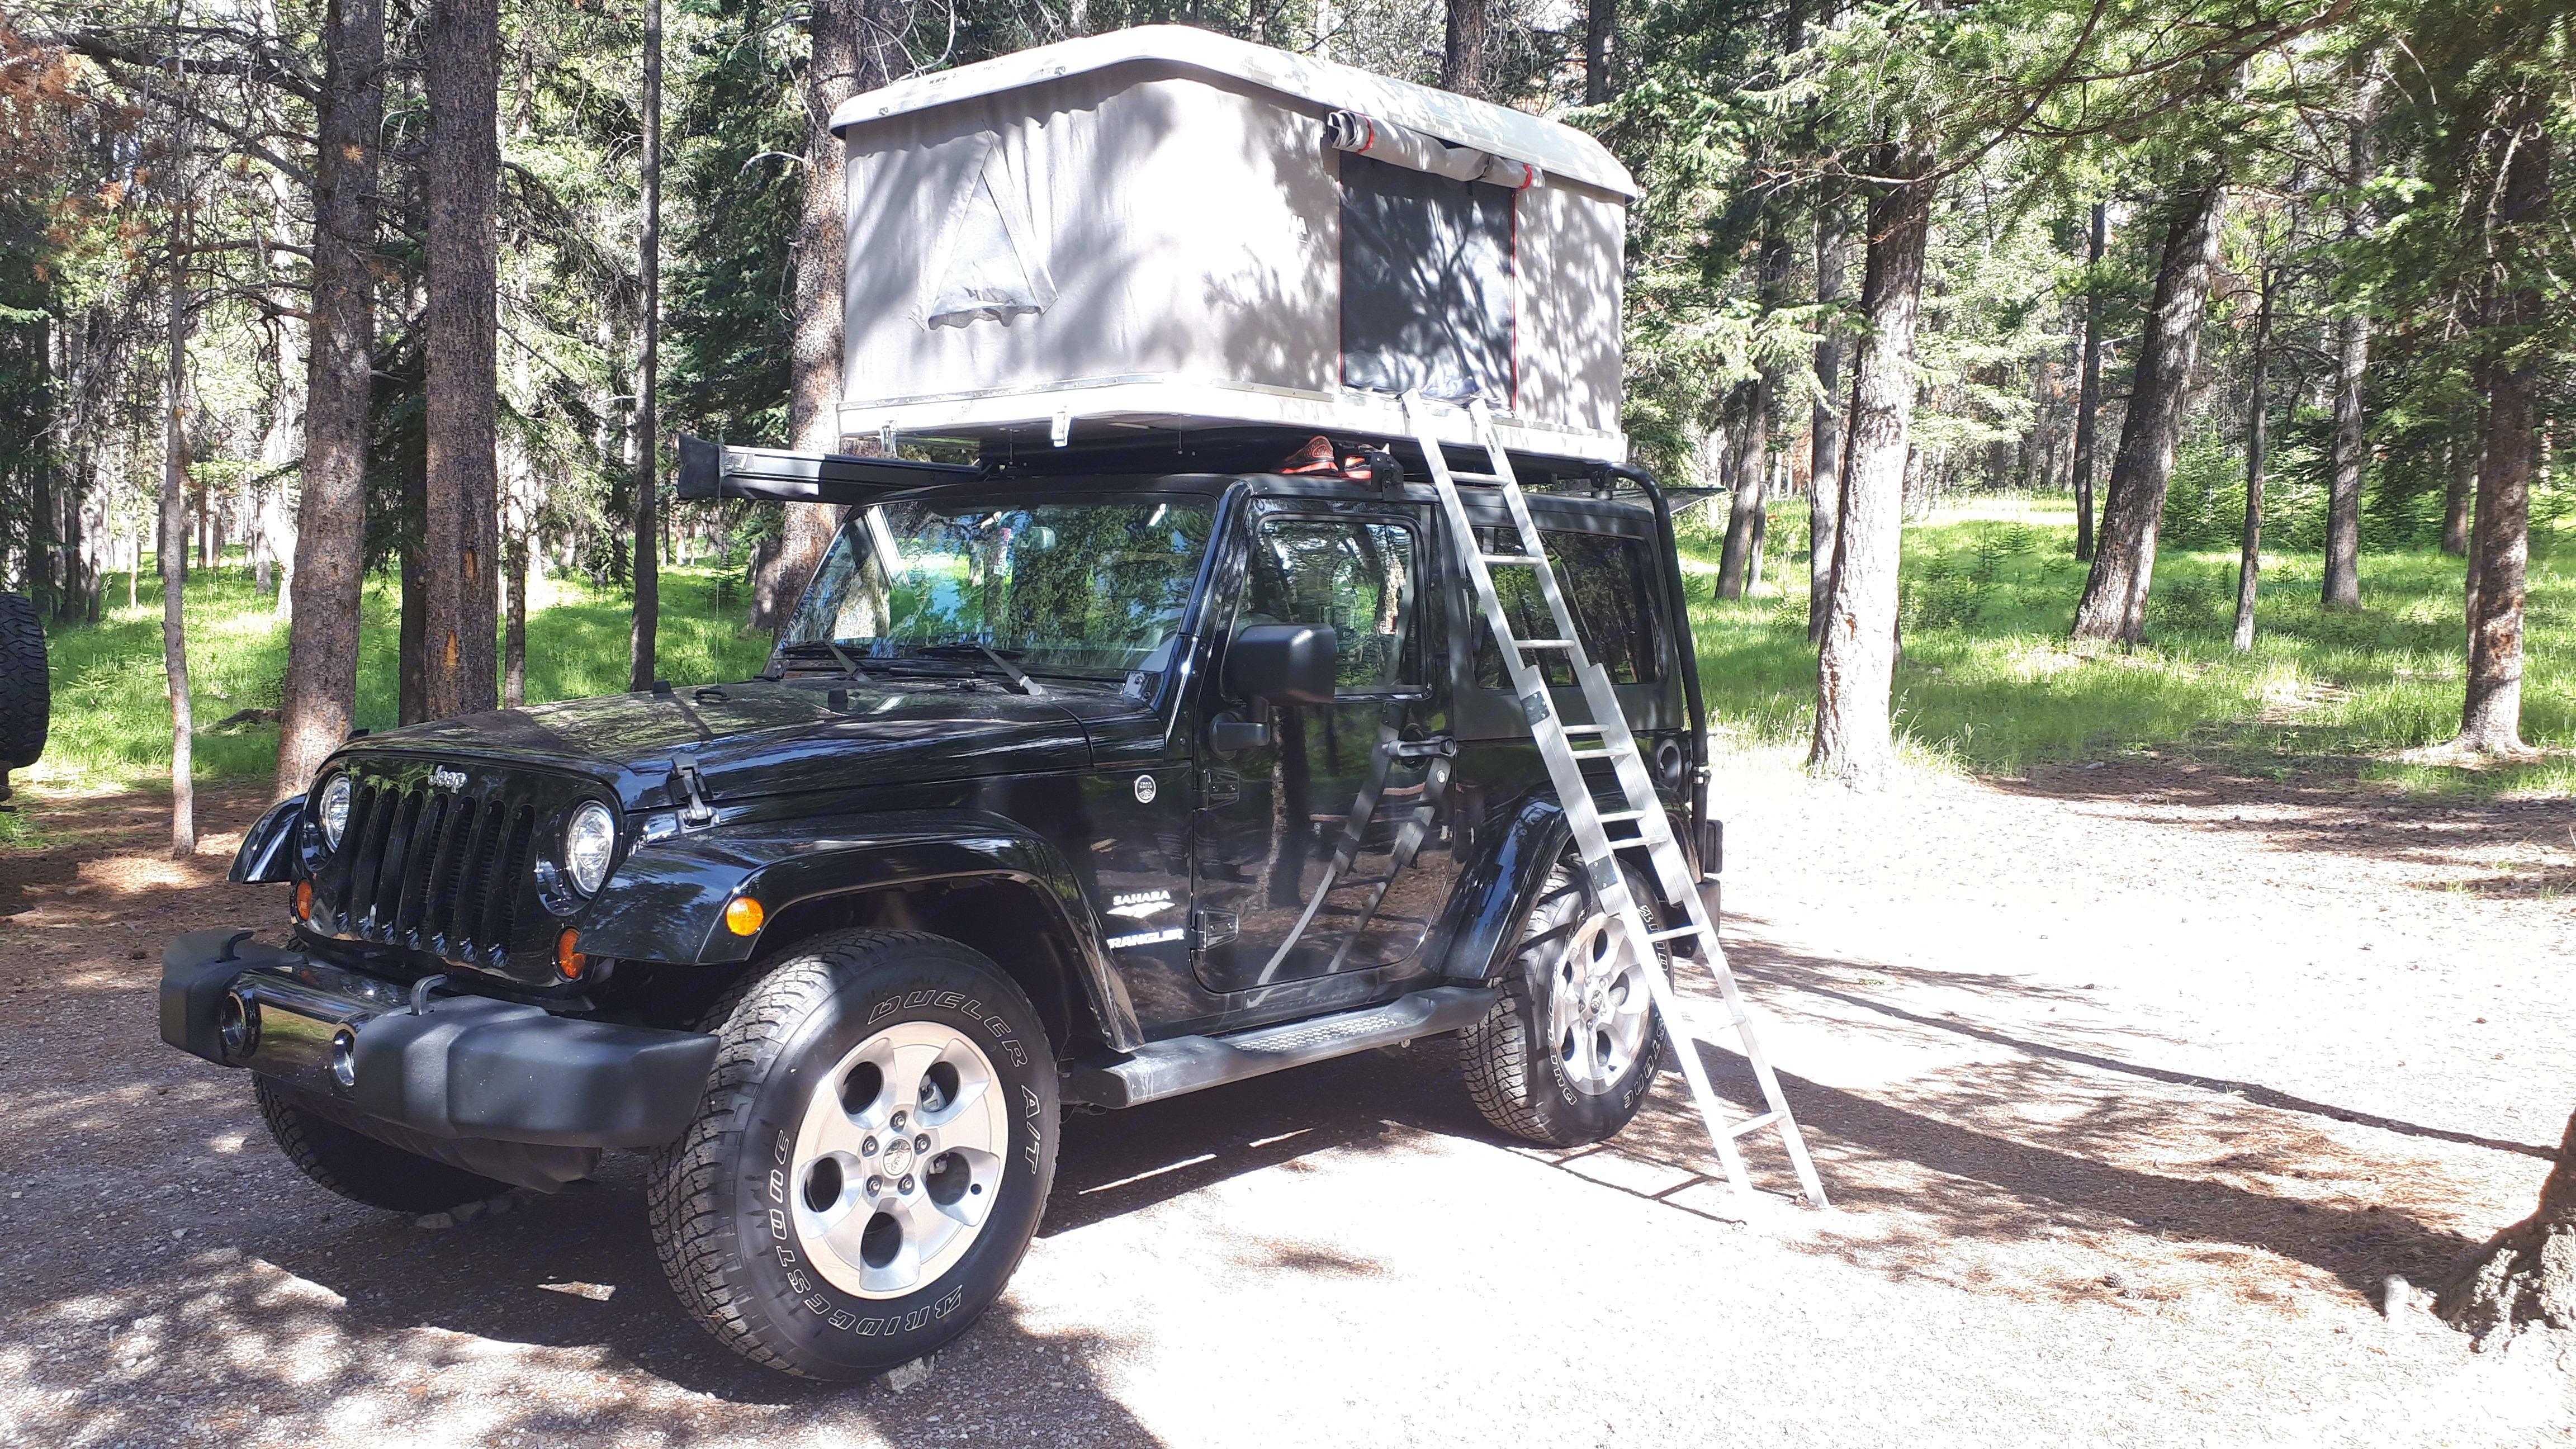 2-door Jeep JK Sahara with Autohome Roof top tent. Jeep Wrangler JK 2013